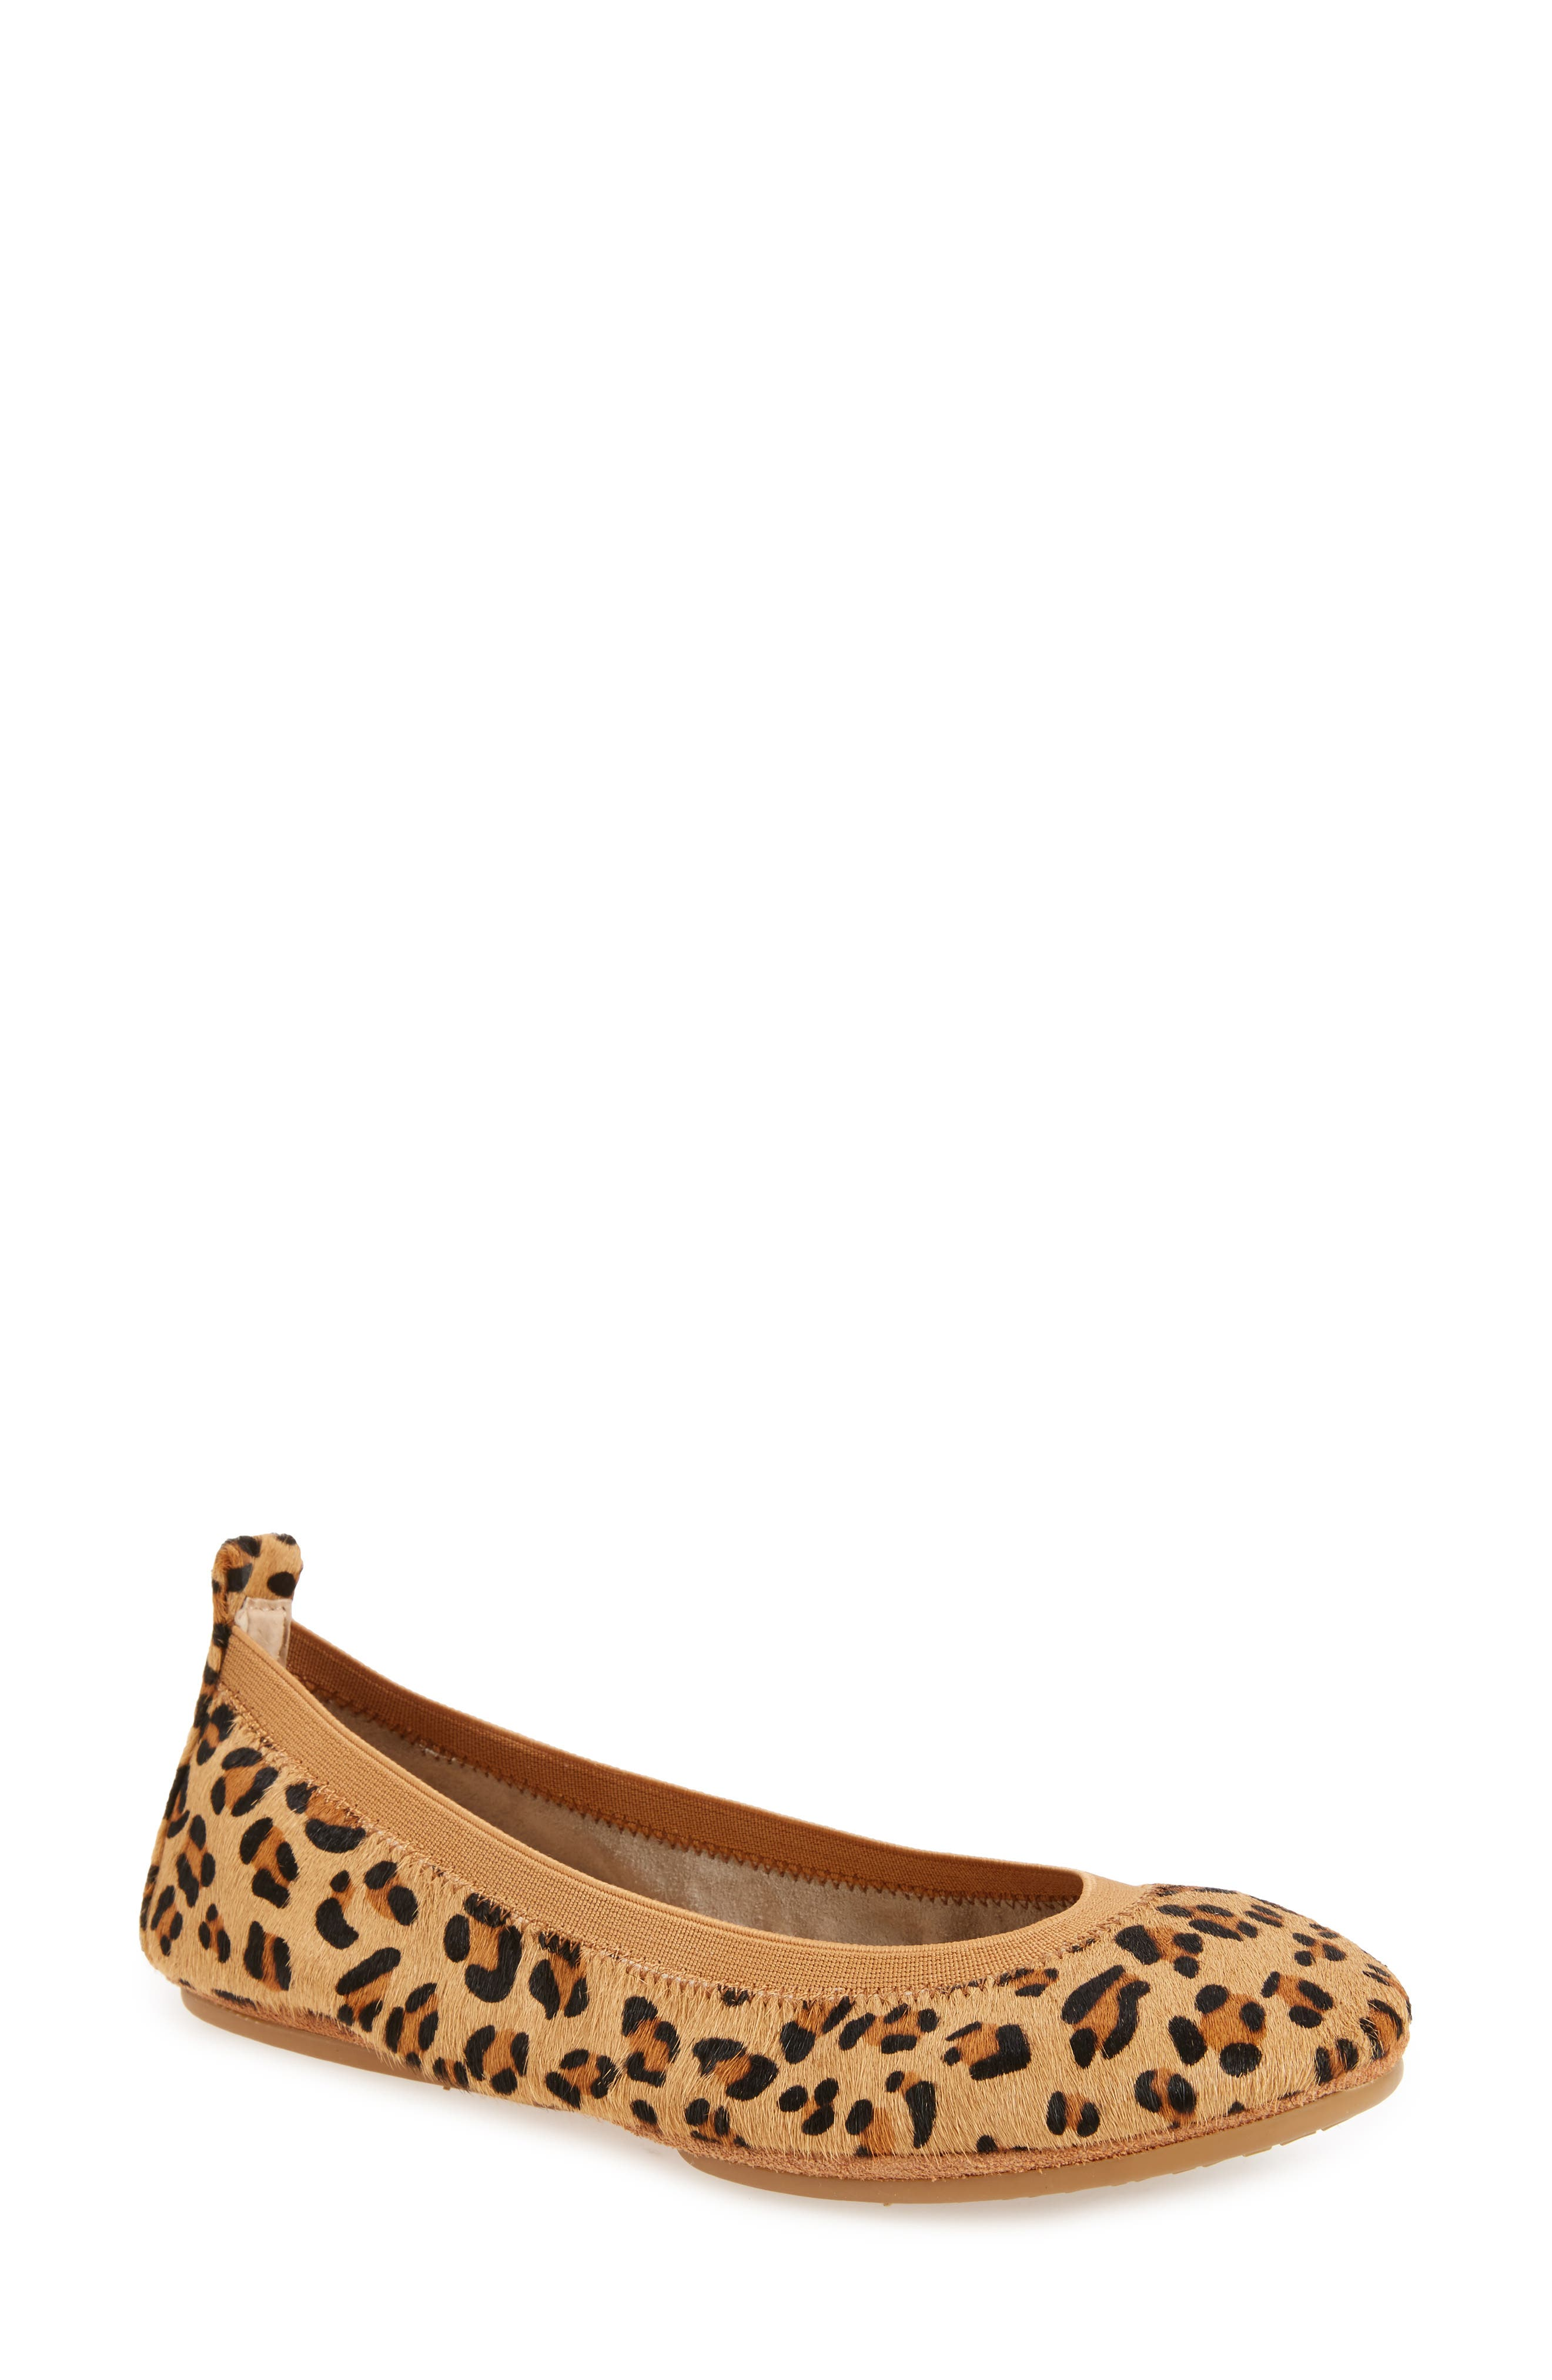 Samara 2.0 Foldable Ballet Flat,                         Main,                         color, Natural Leopard Calf Hair